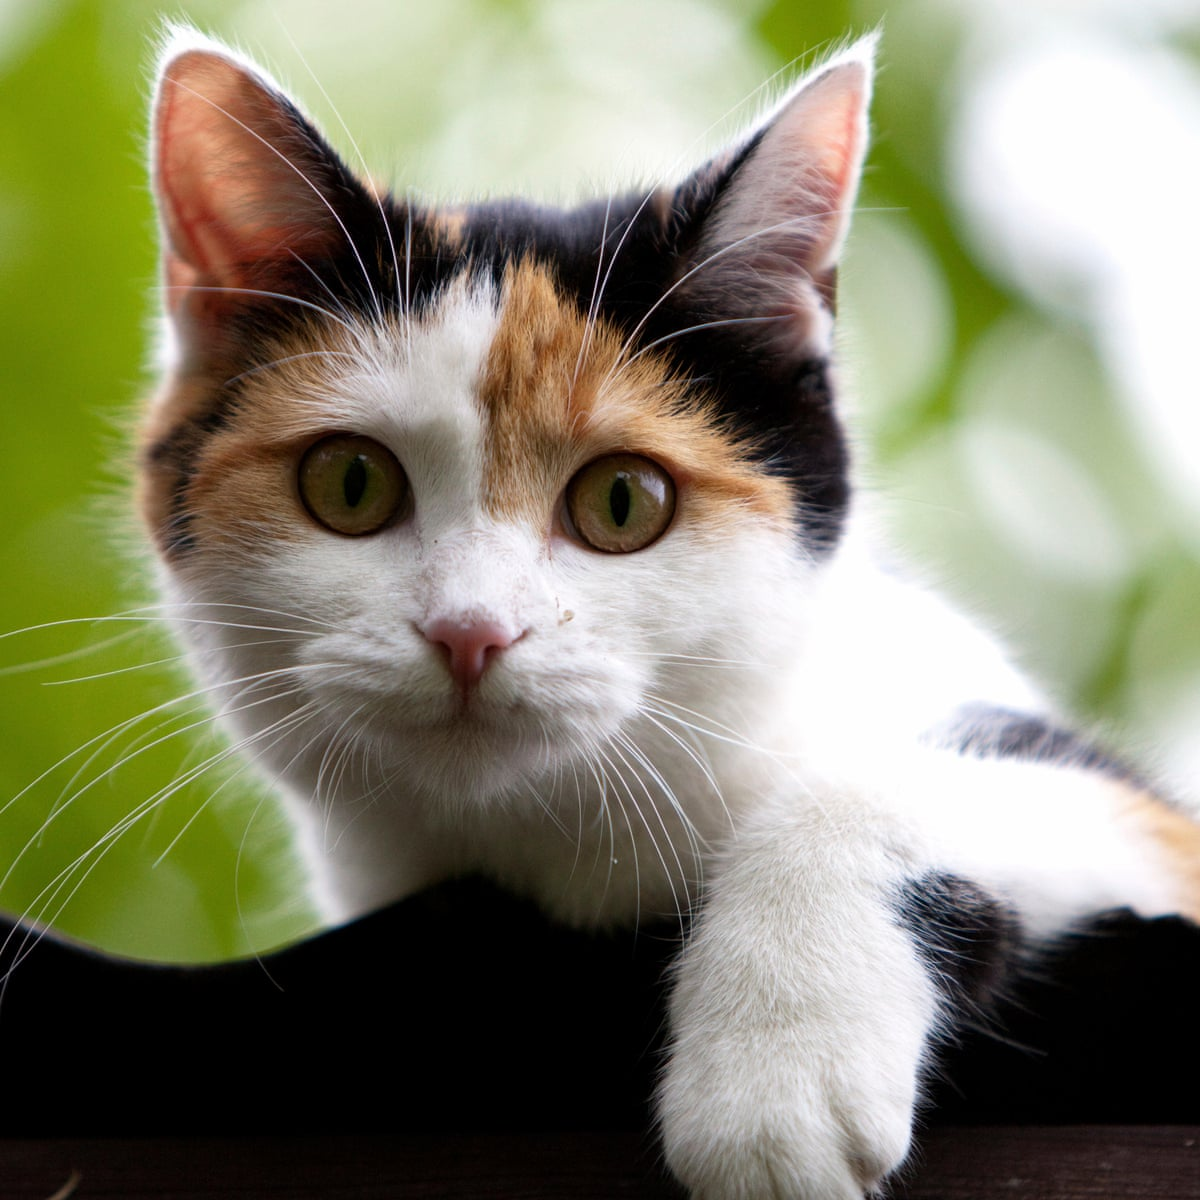 kedim kabız oldu